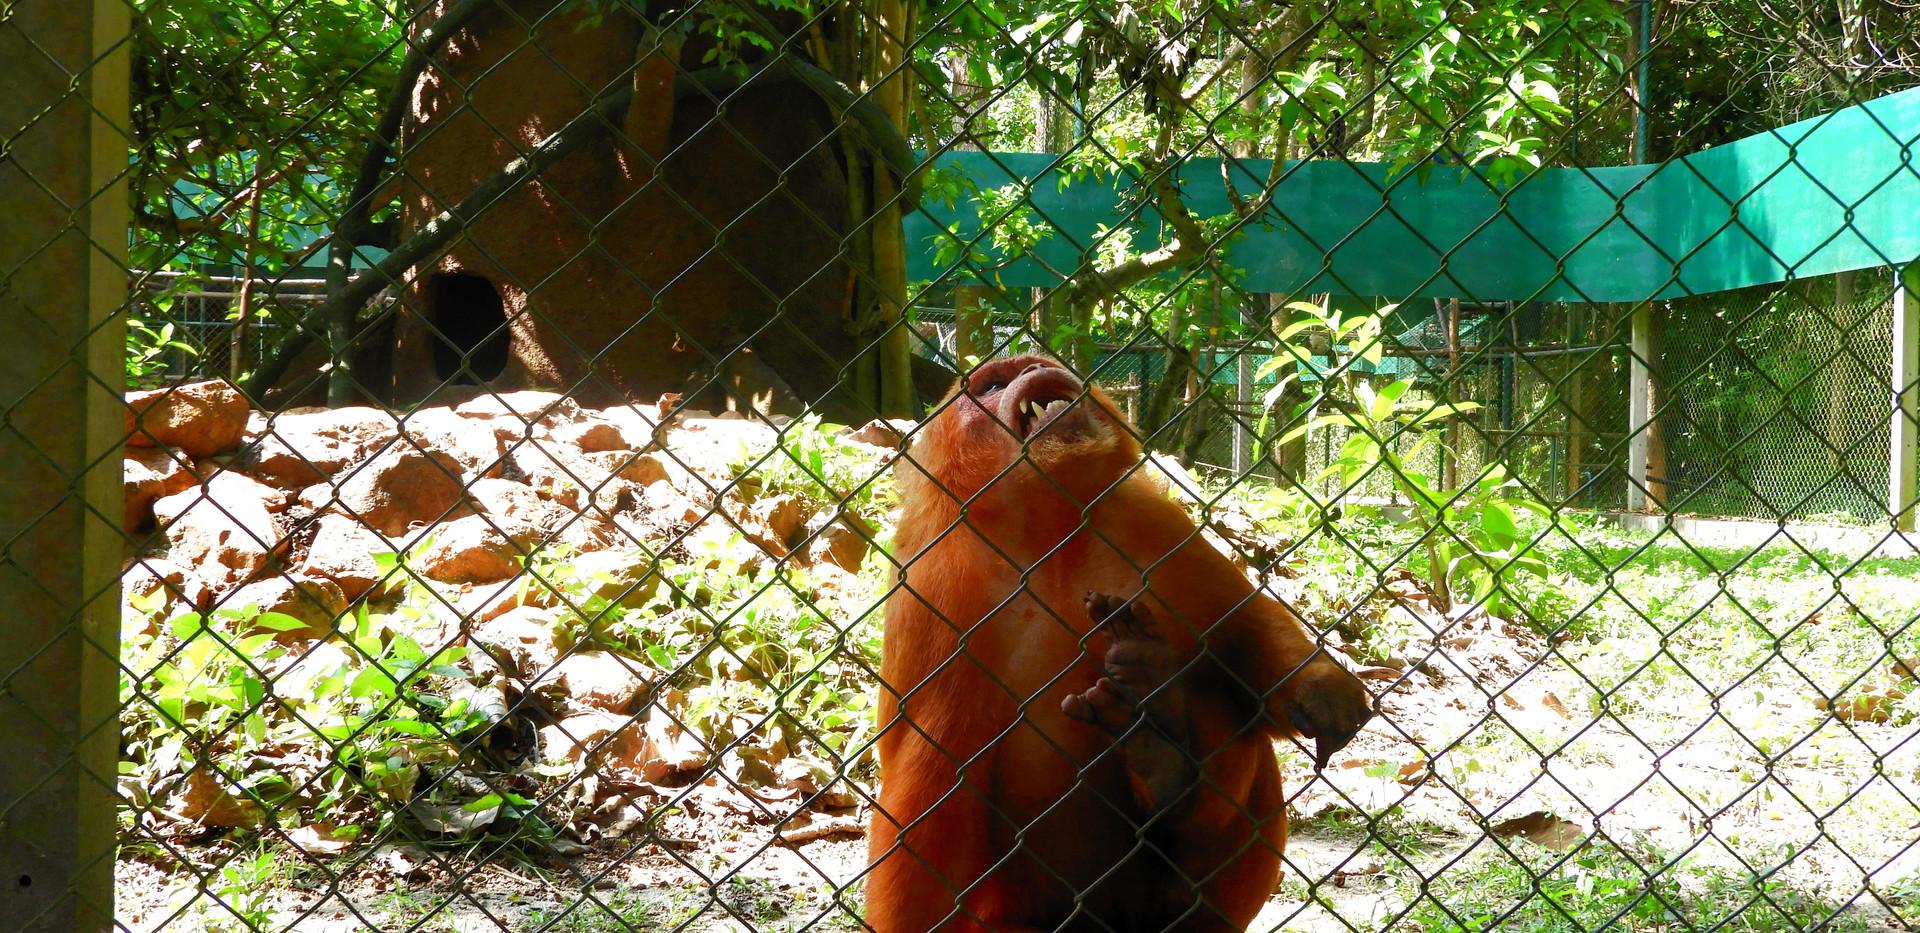 małpa-klatka.JPG